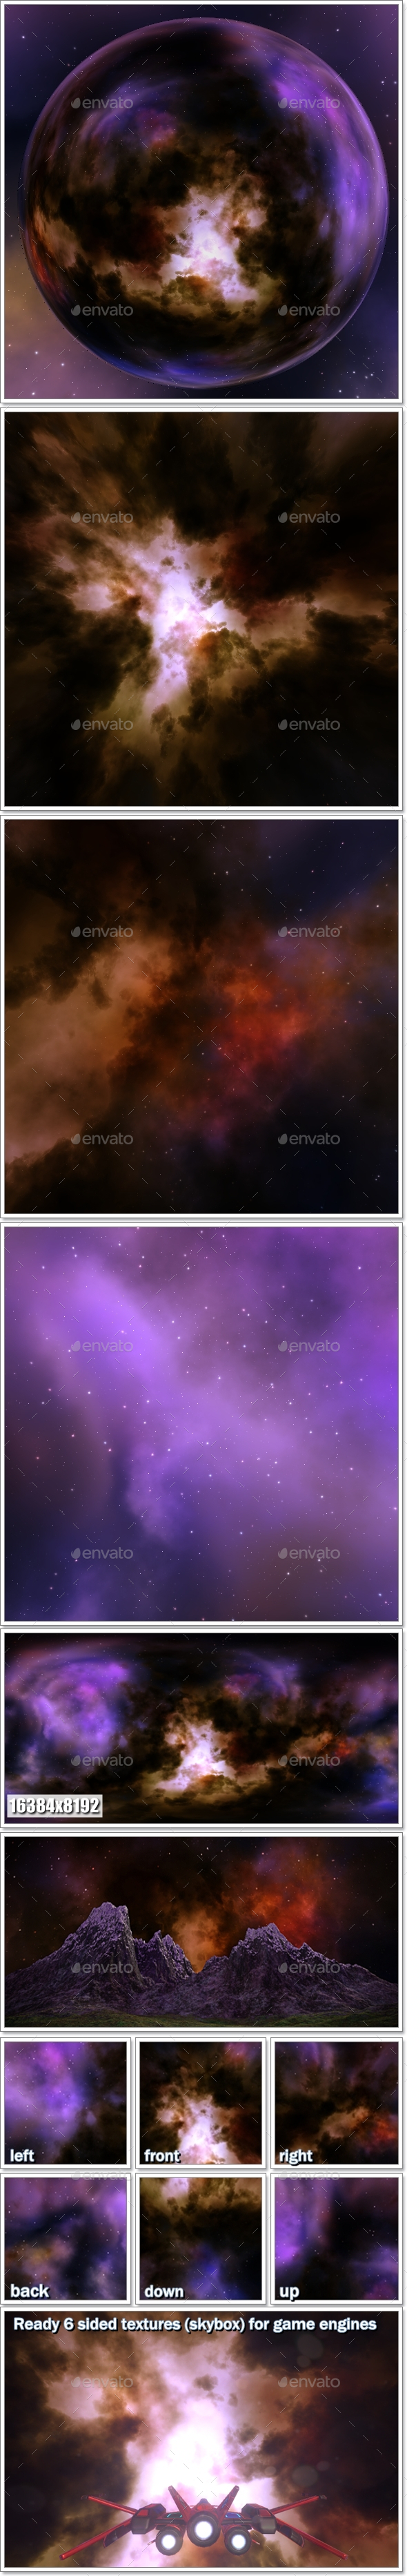 3DOcean Nebula Space Environment HDRI Map 002 20409161